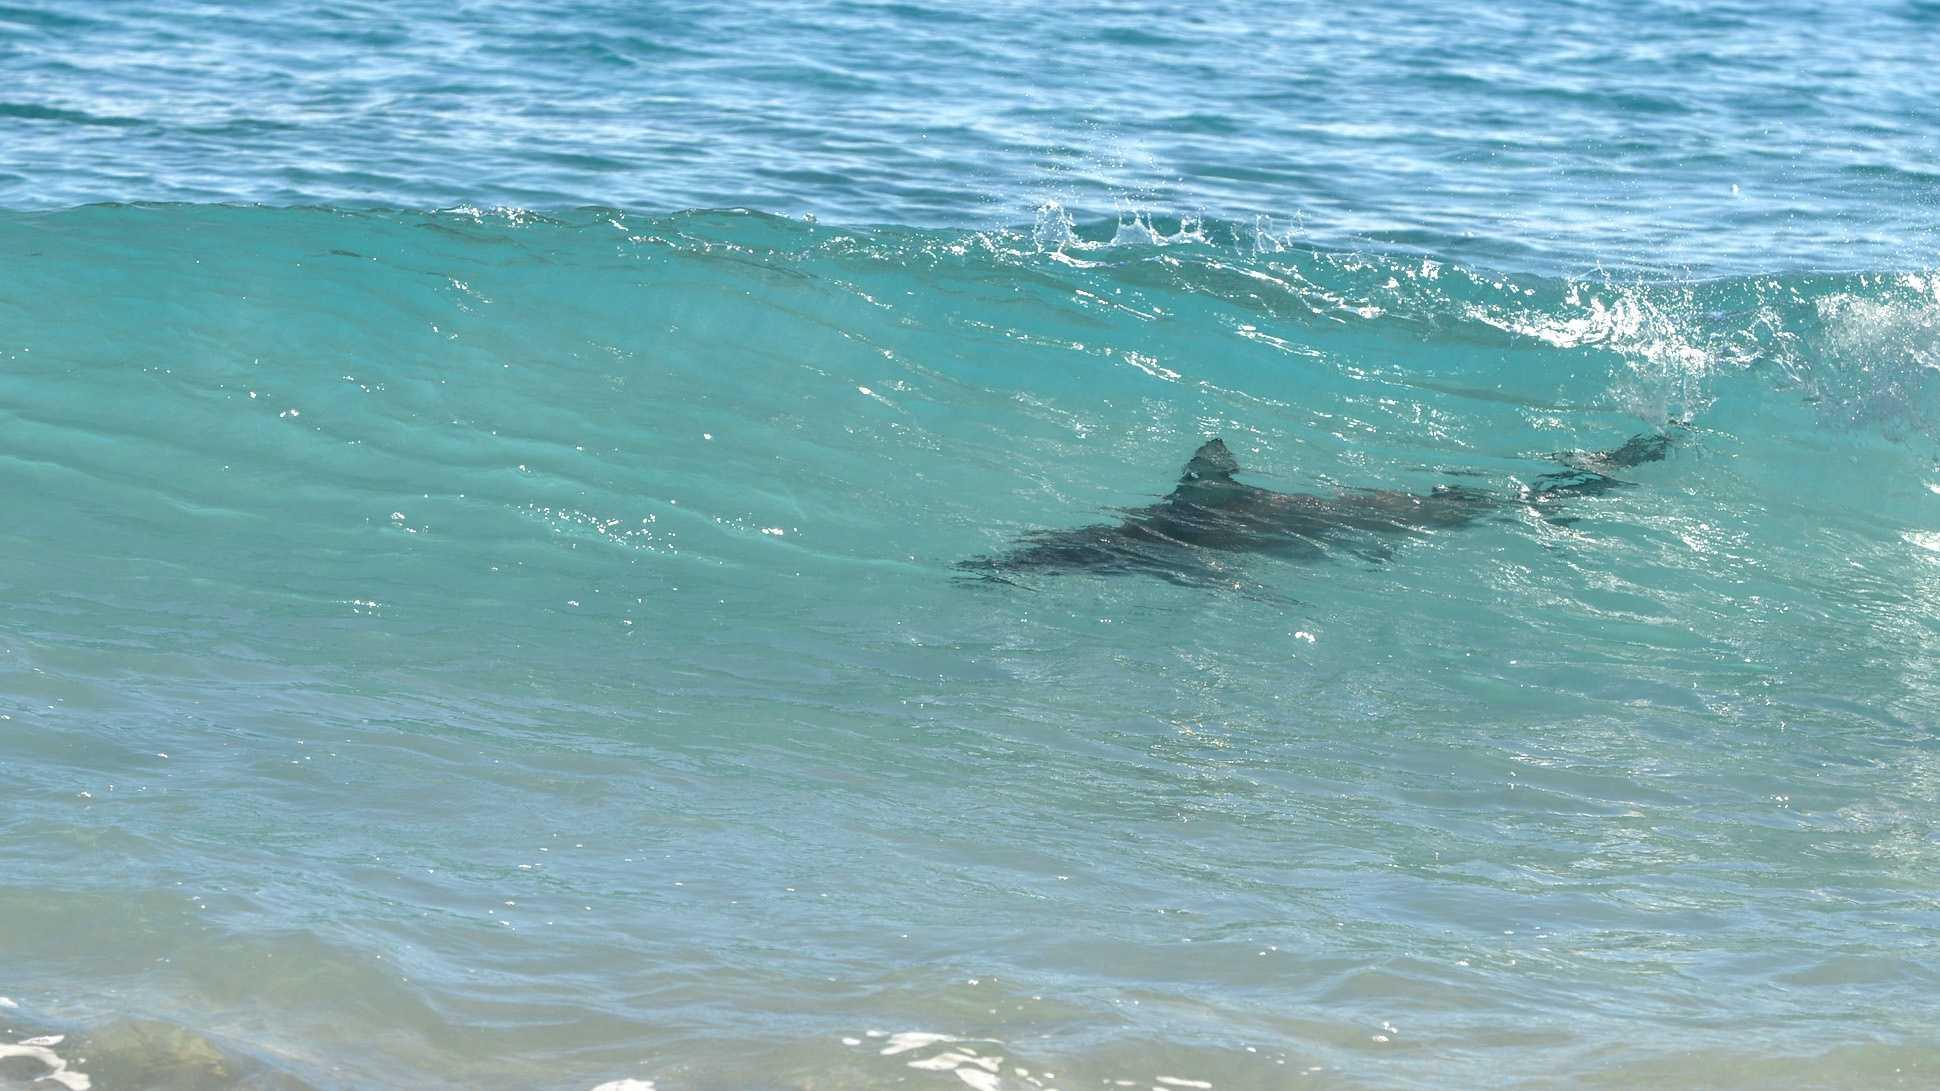 030513 Sharks 4.jpg